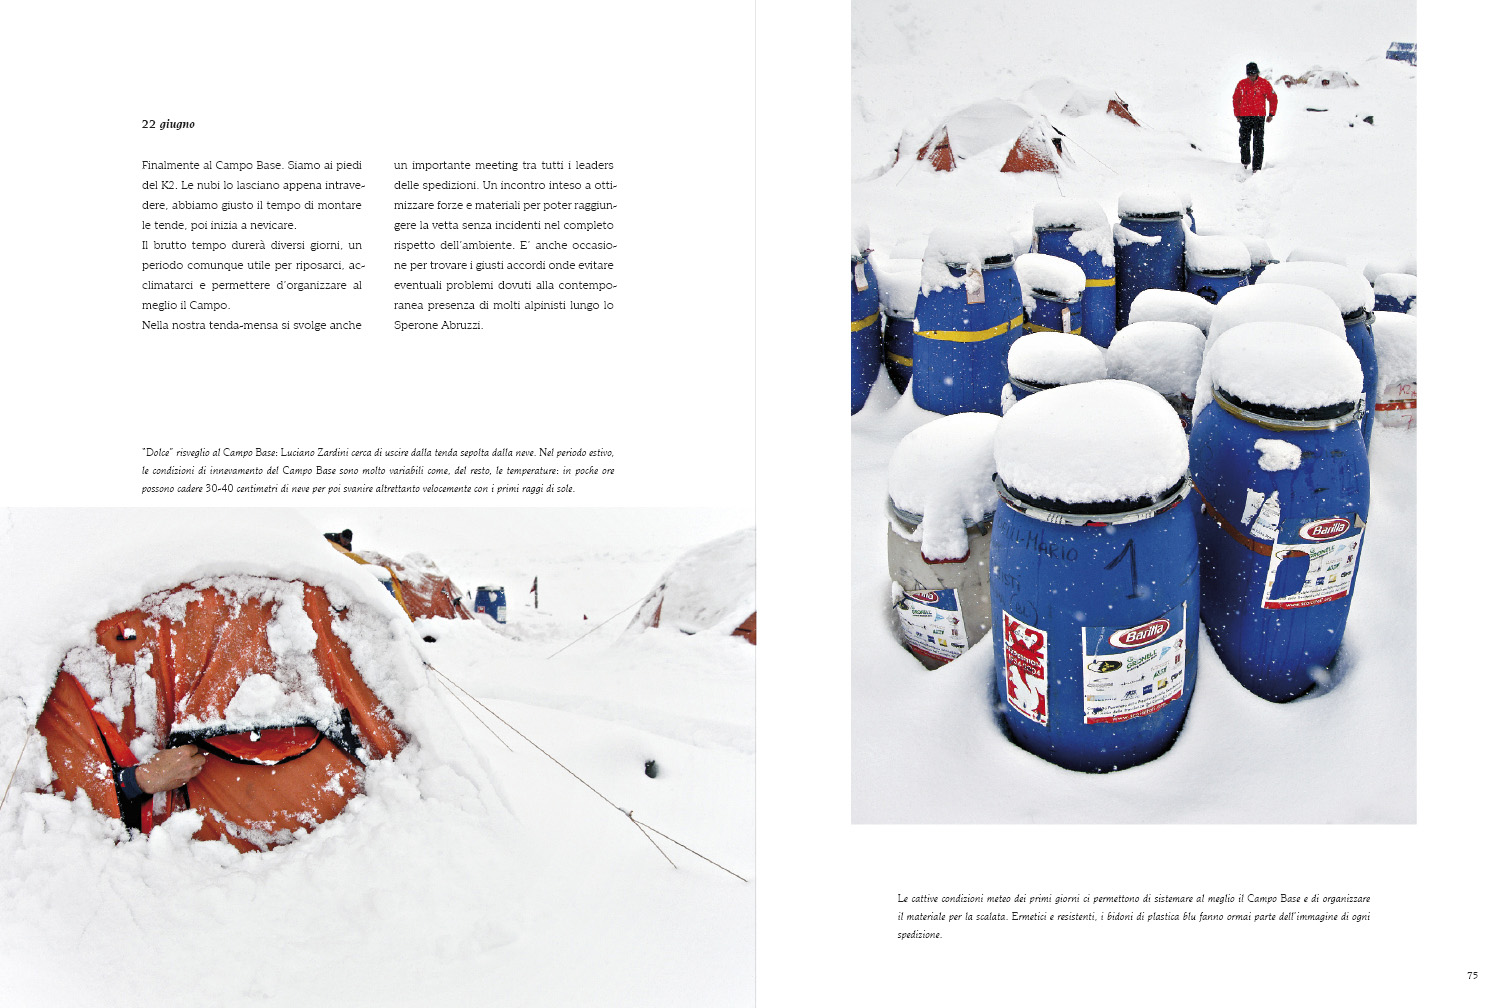 K2 EXPEDITION 1954-2004 Giuseppe Ghedina Fotografo - 039.jpg